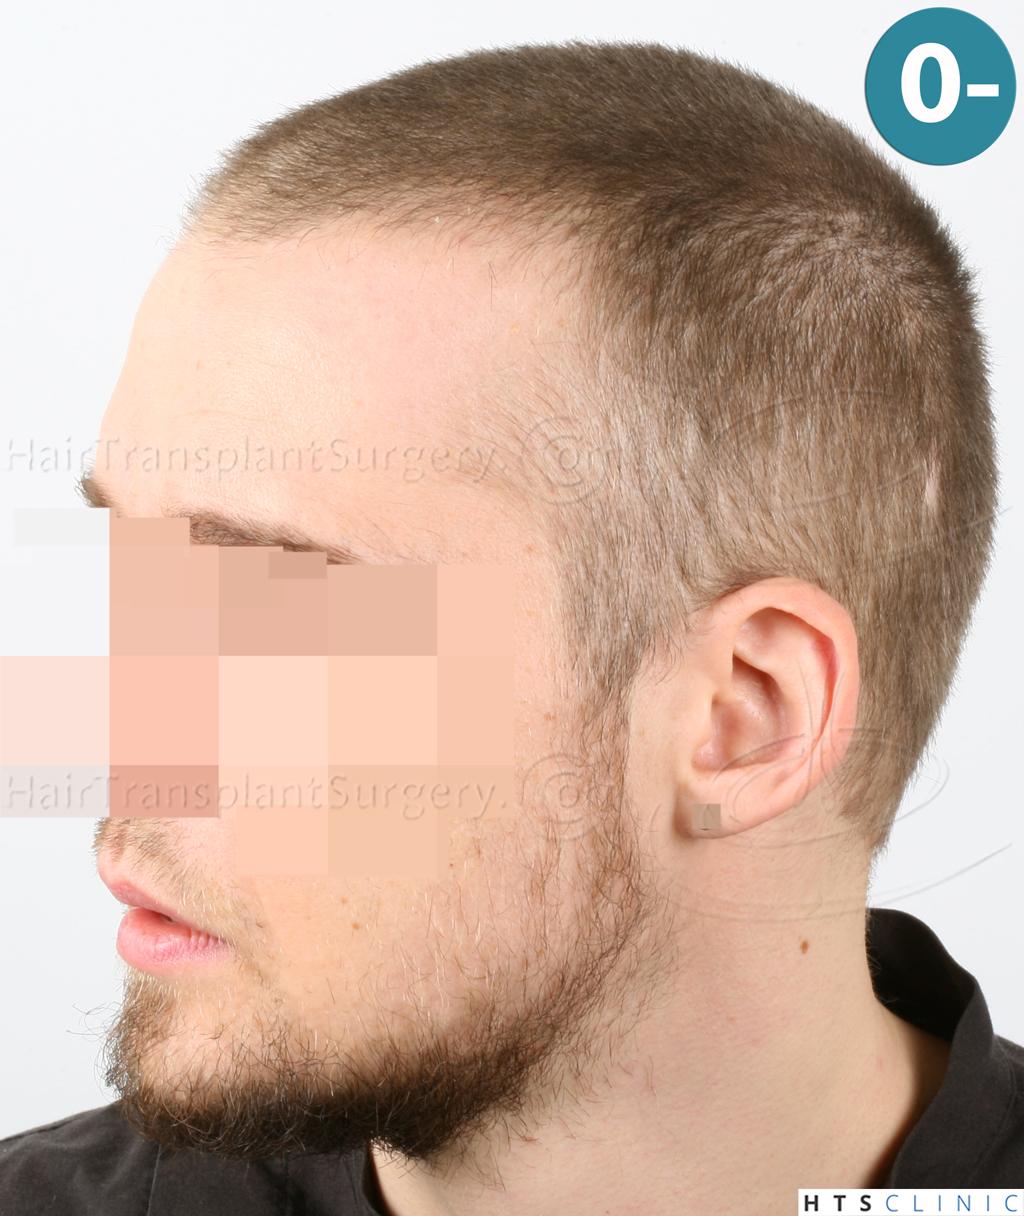 Dr.Devroye-HTS-Clinic-6132-_2011_1232_2889_-FUE-Barbe-et-cheveux-4.jpg